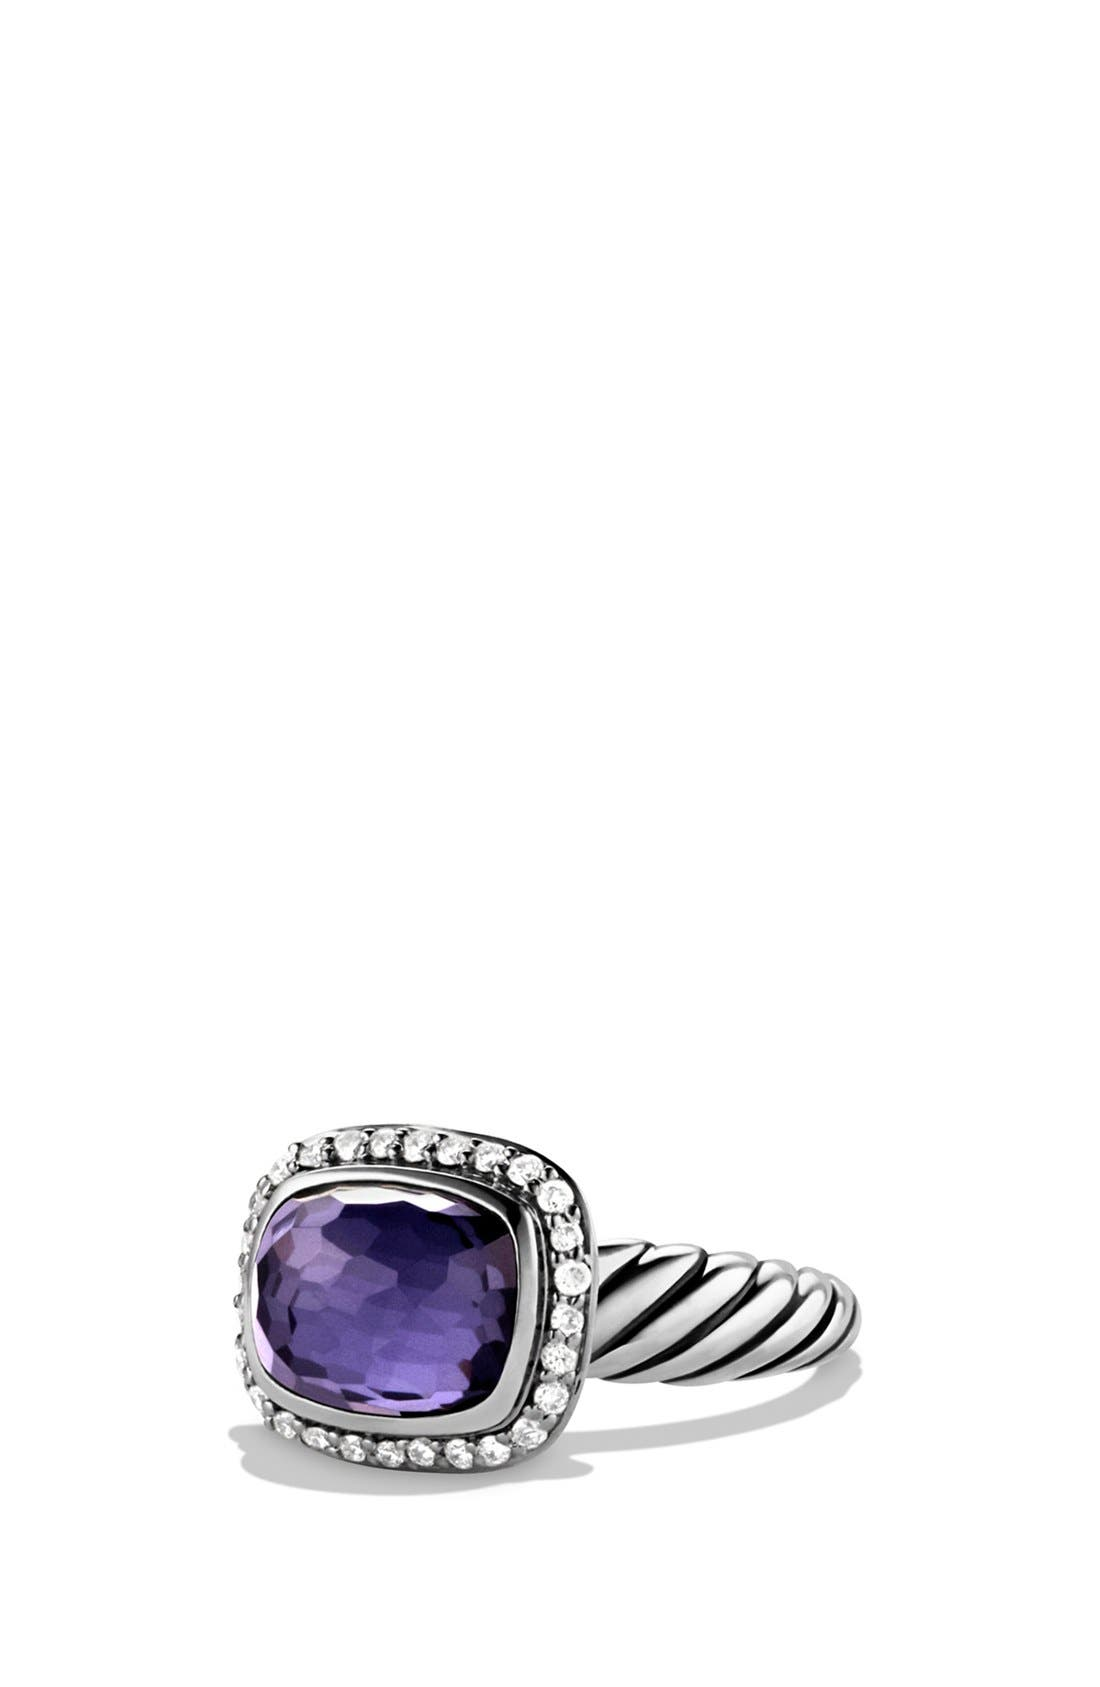 Alternate Image 1 Selected - David Yurman 'Noblesse' Ring with Diamonds